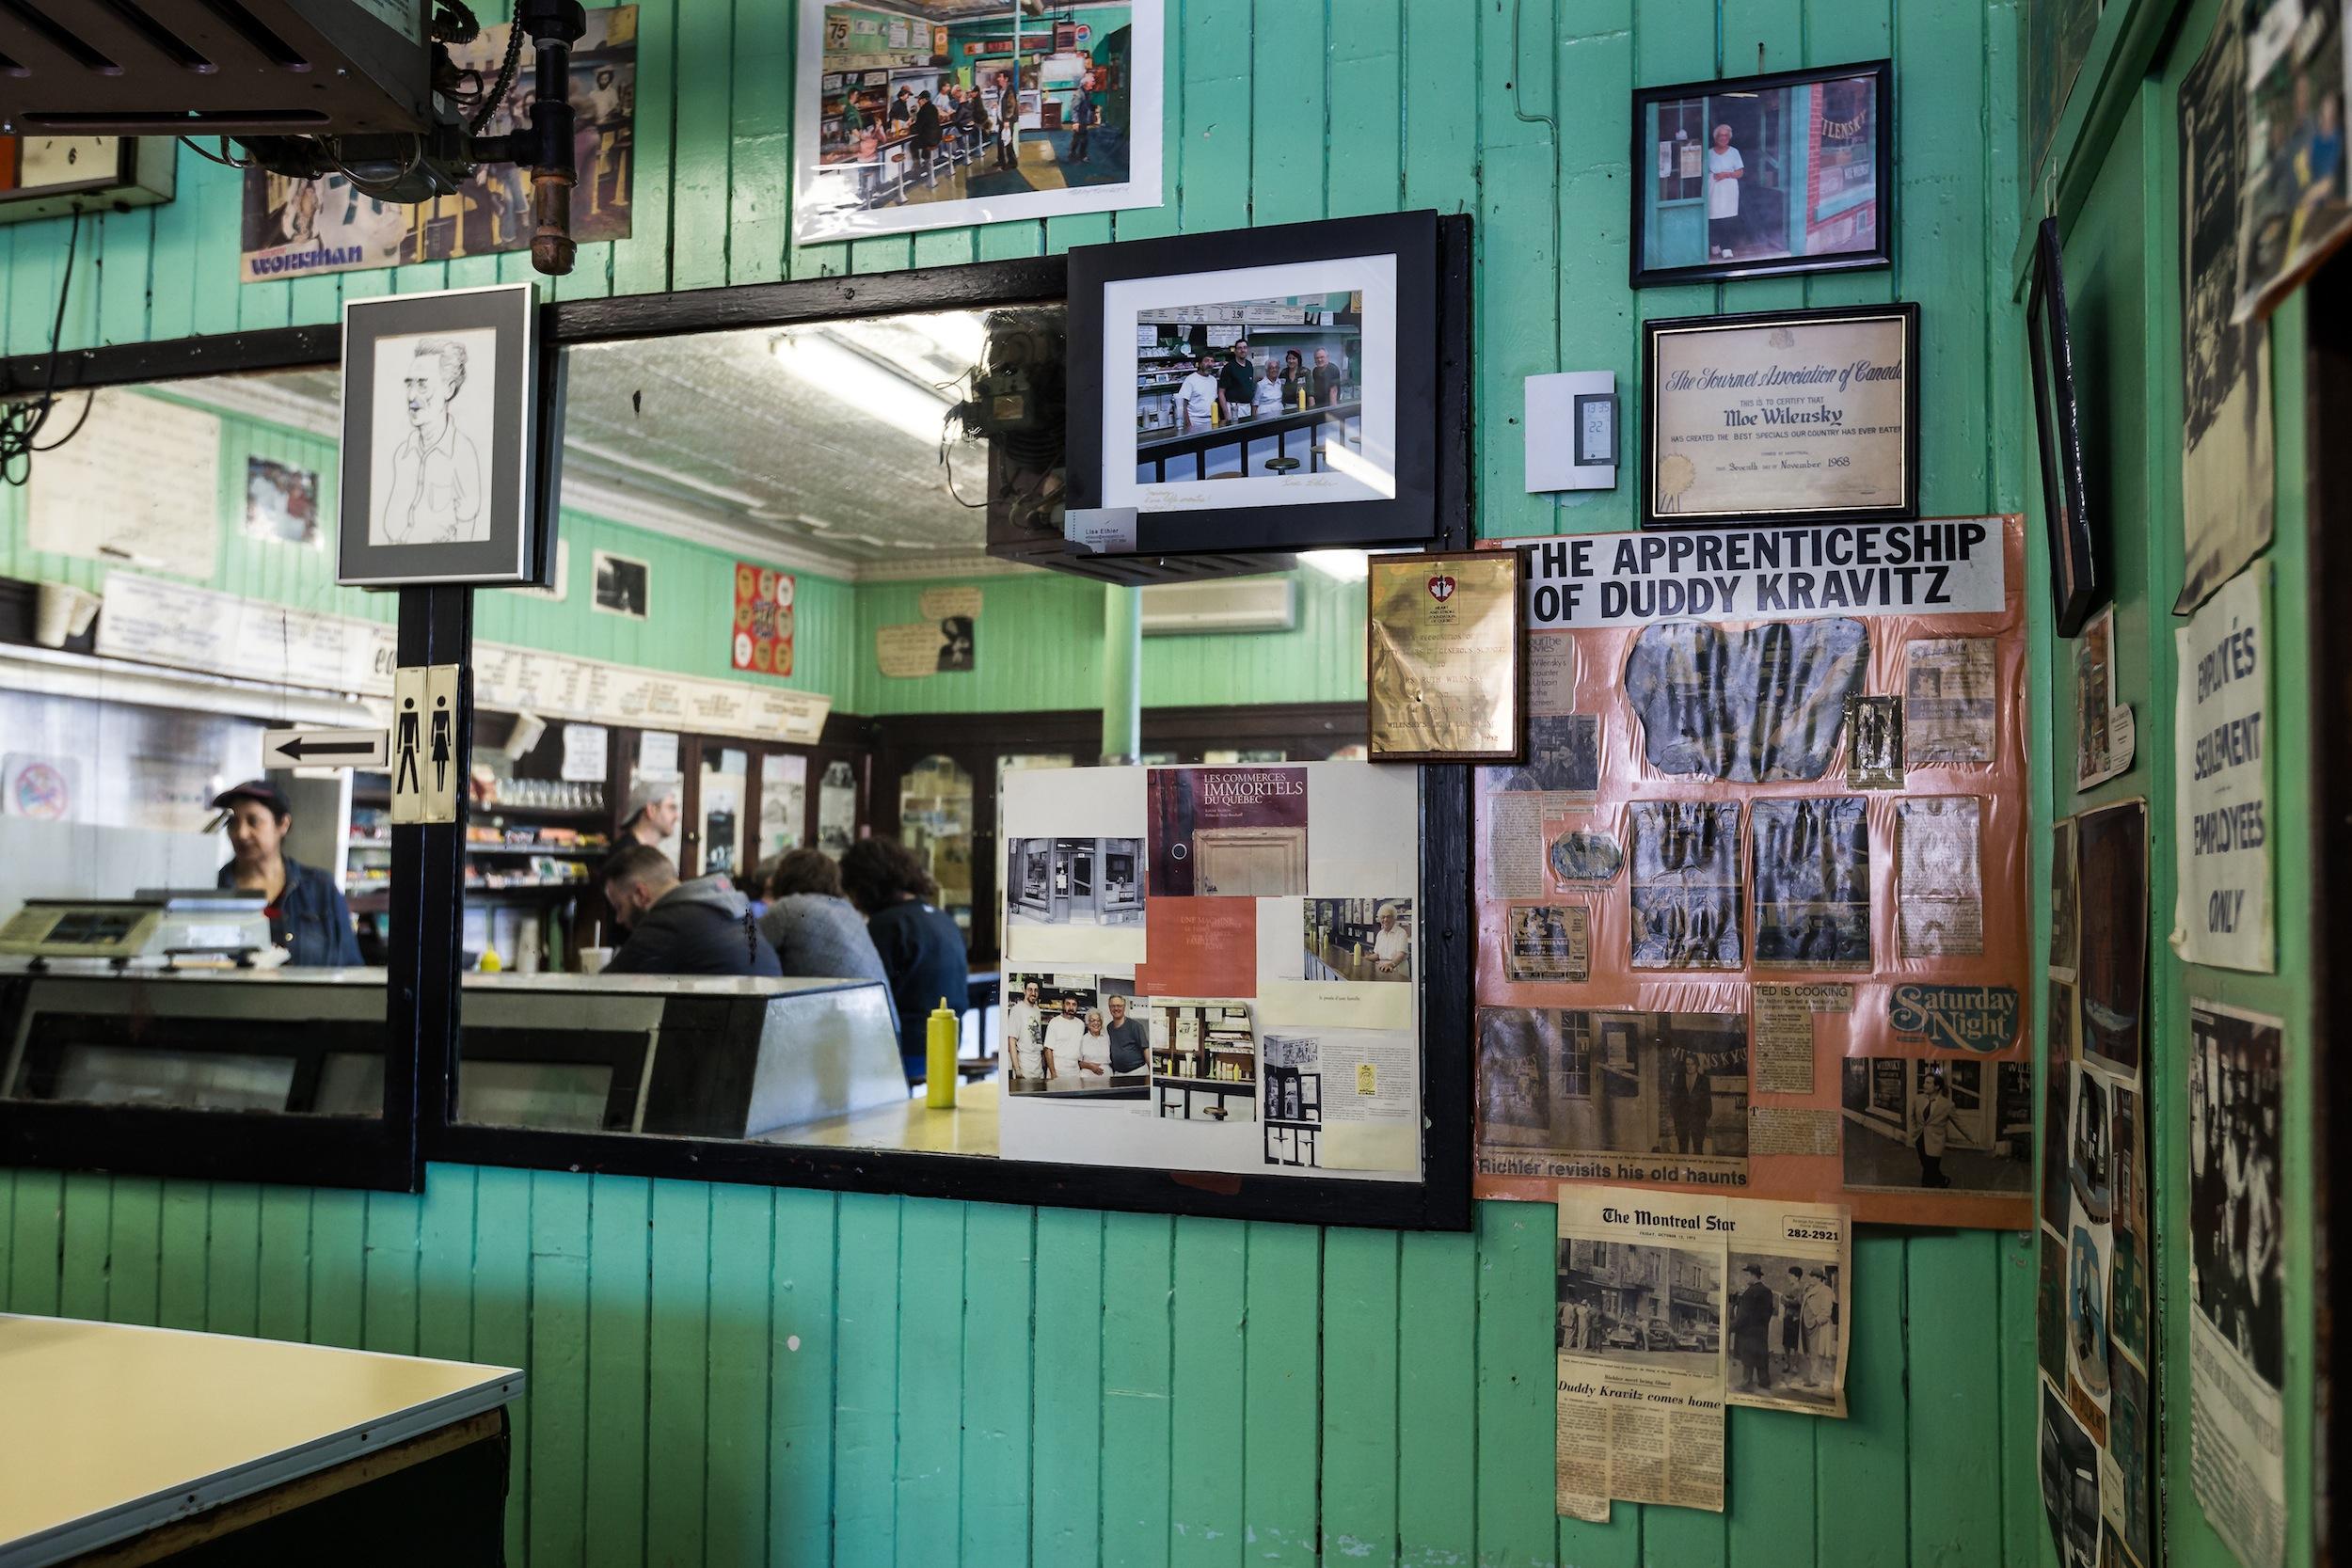 Inside Wilensky's